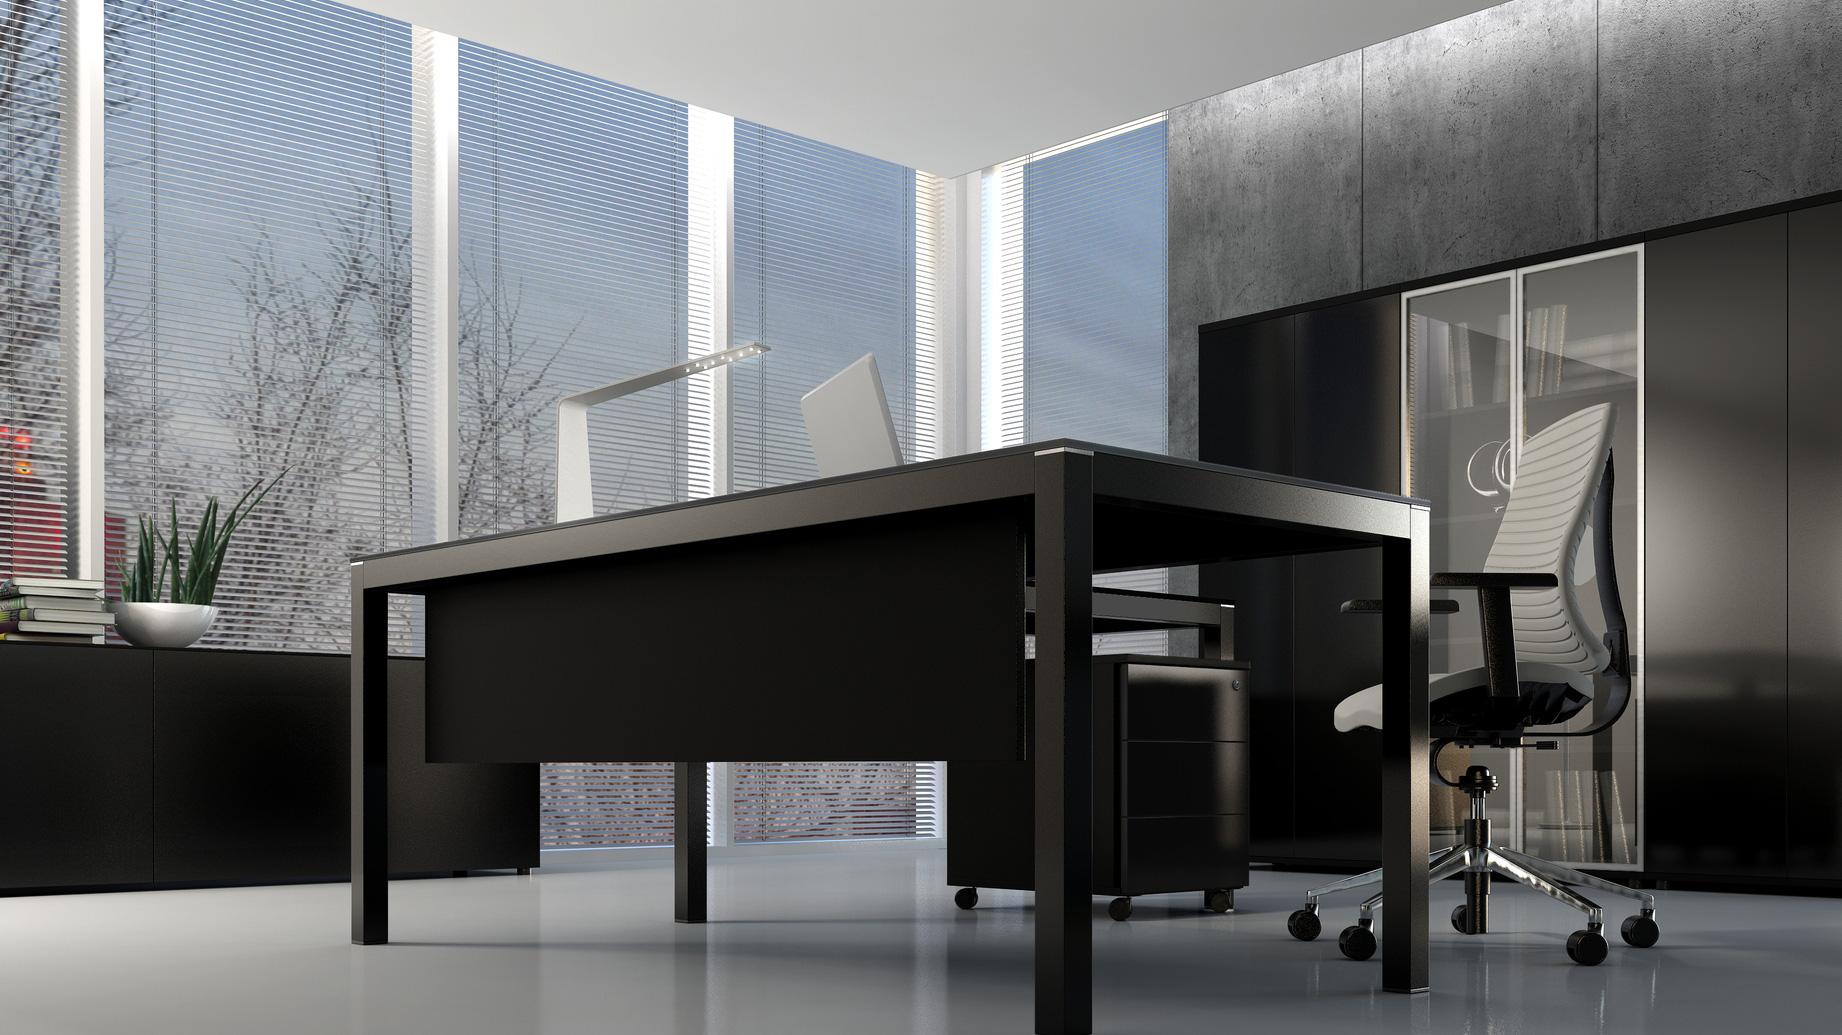 STOCK Büroeinrichtungen - Chefzimmer Büromöbel Serie Mover